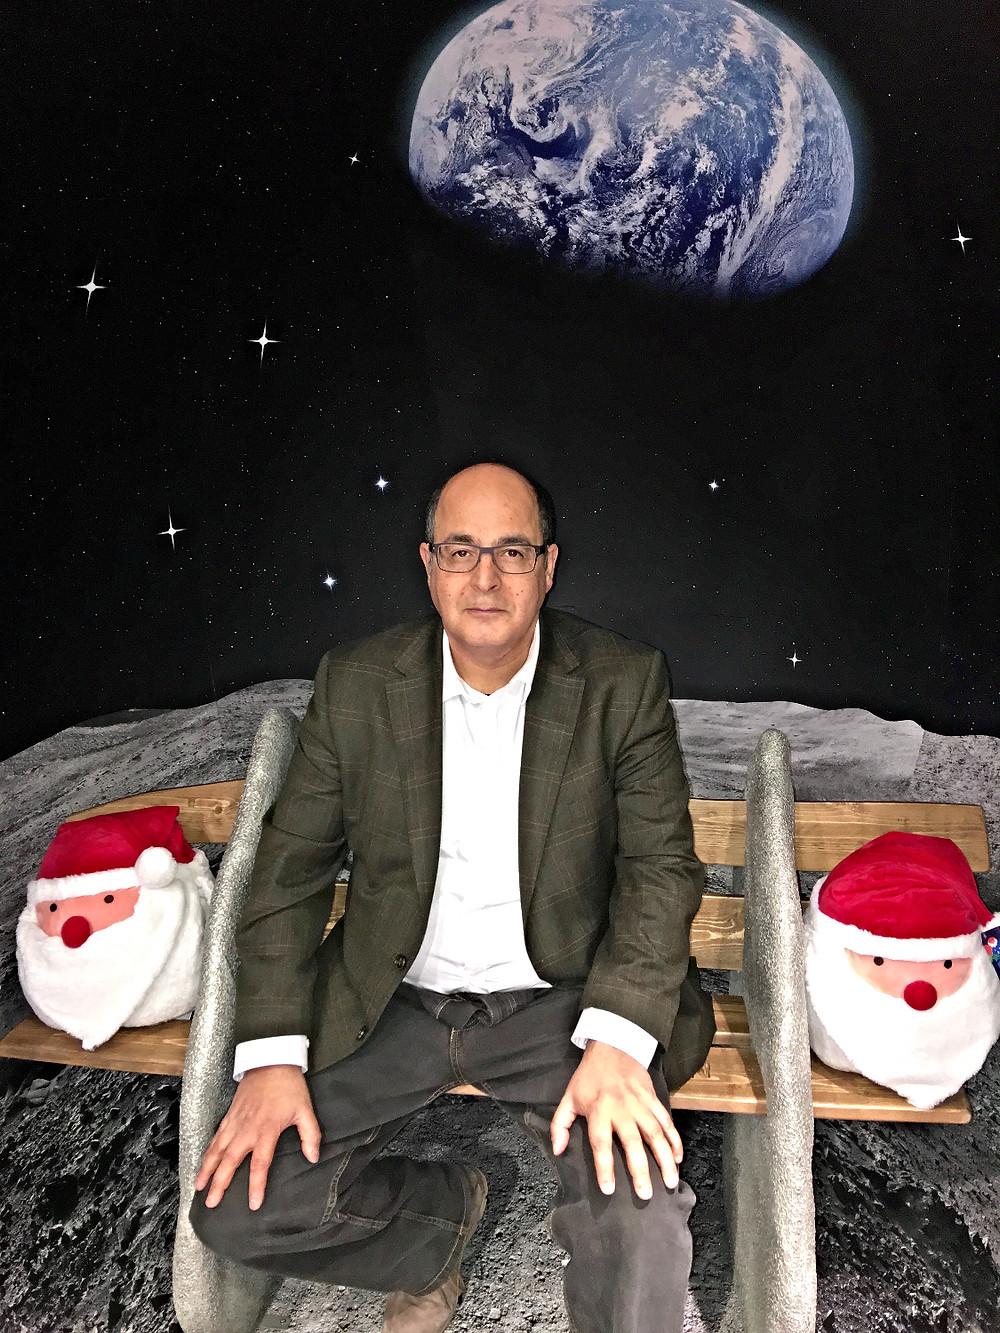 John Lewis Gabay man in the moon